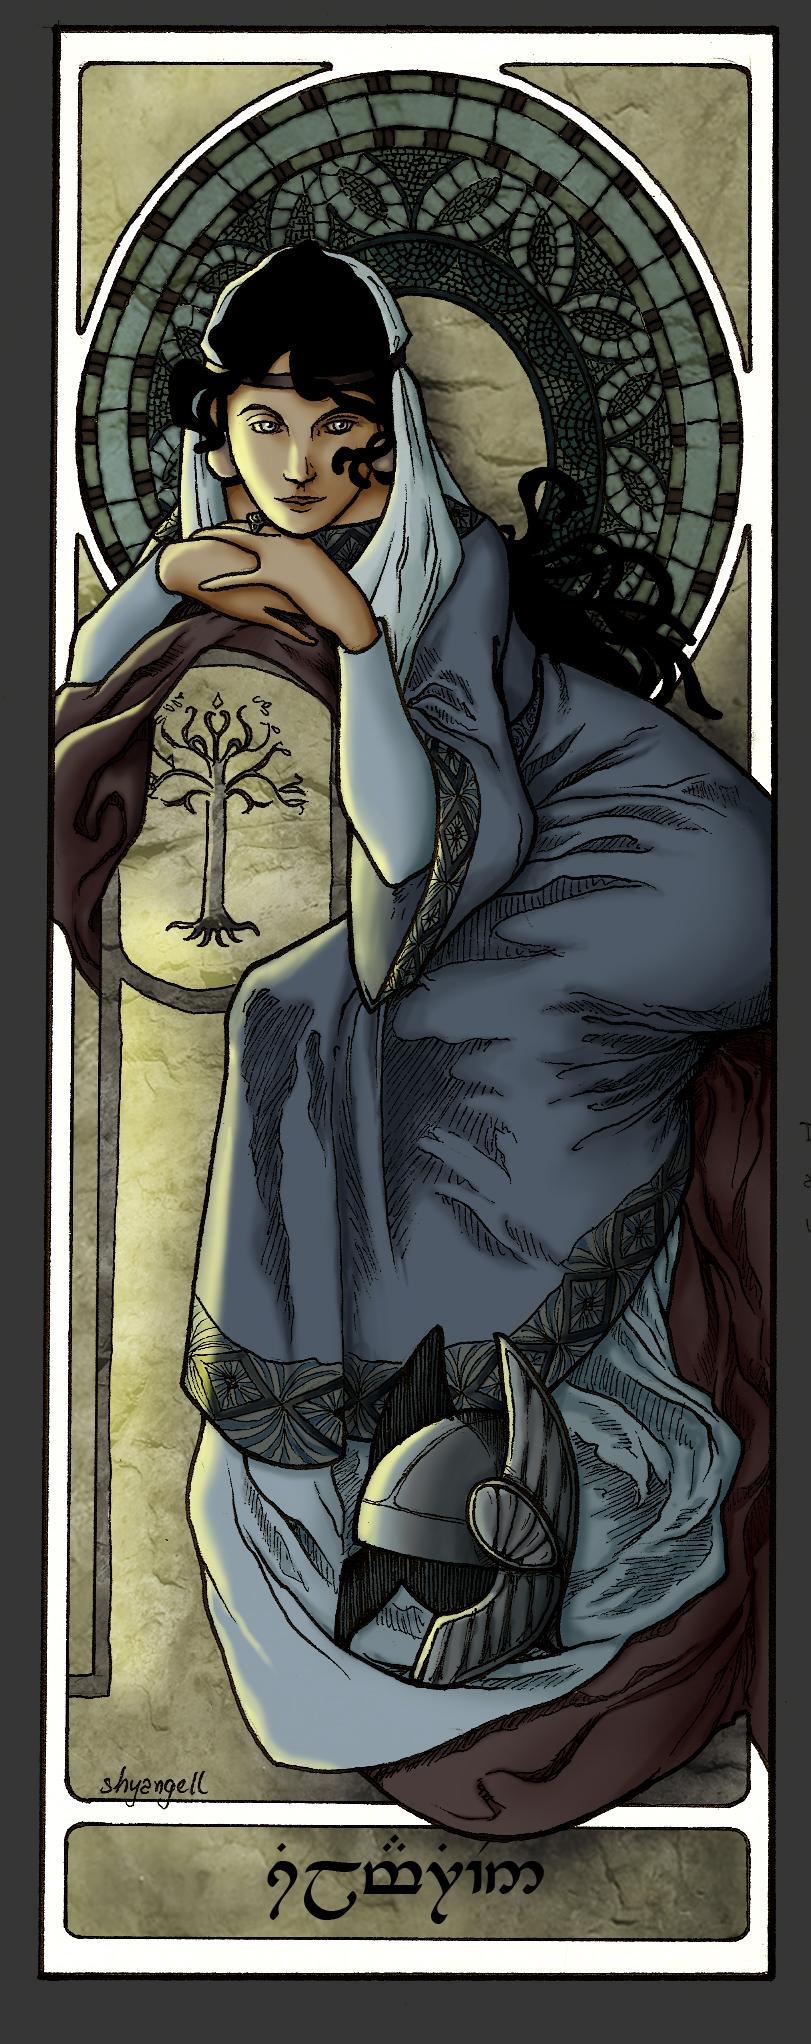 Queens Of Numenor - Princess Silmarien by shyangell